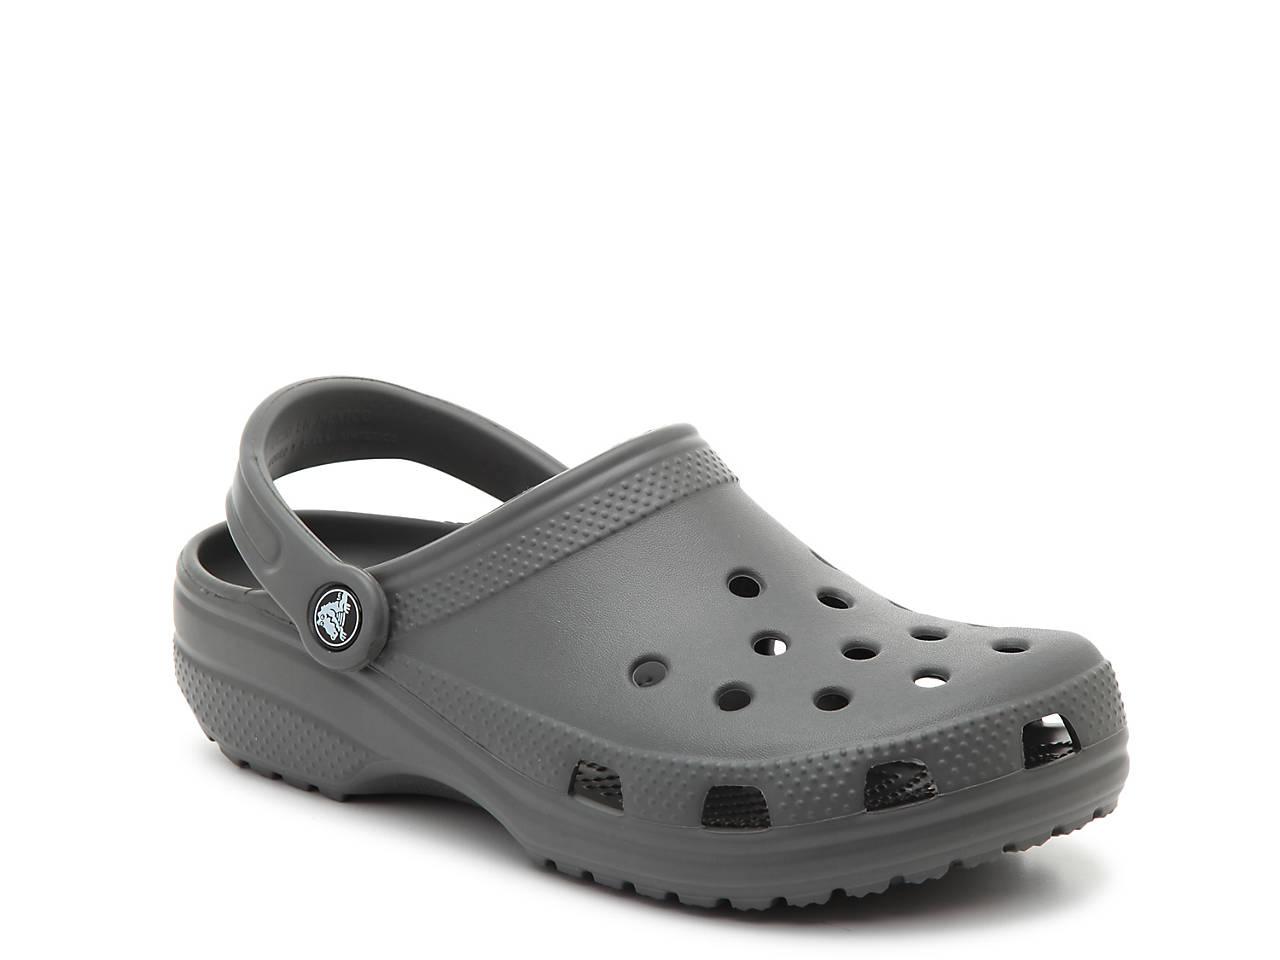 2cdc33dc079a Crocs Classic Vent Clog Women s Shoes